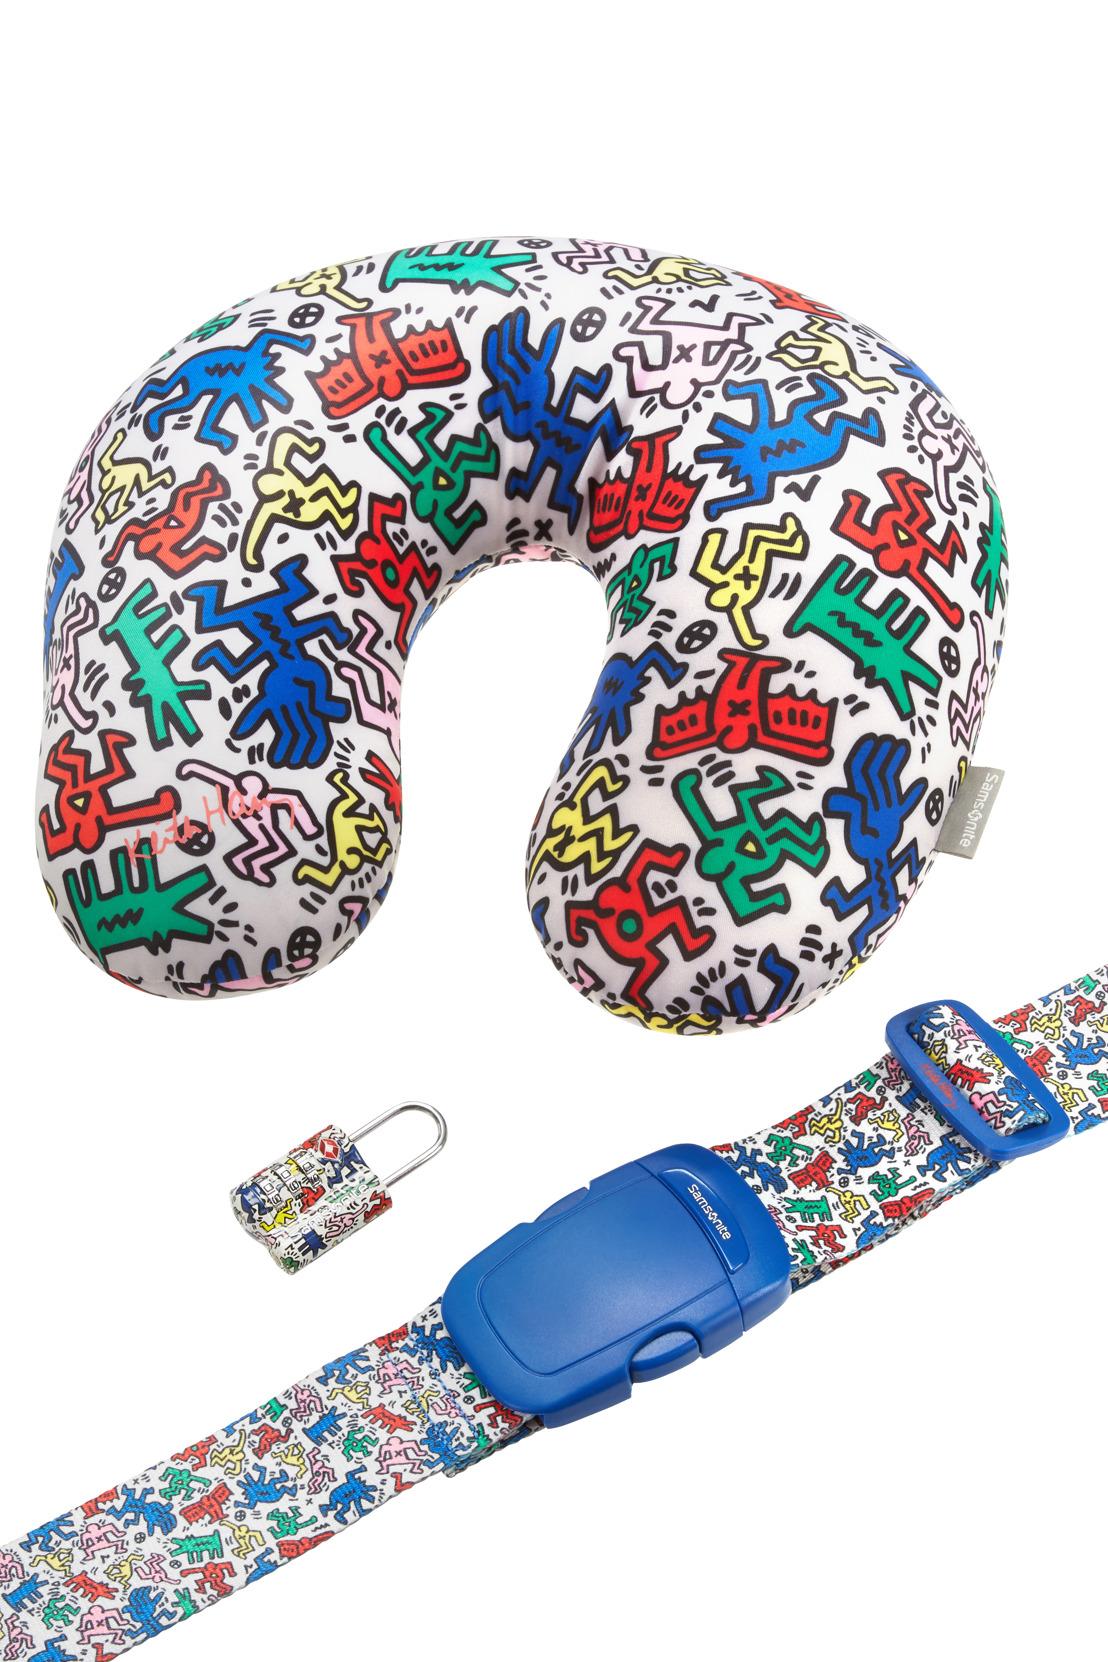 Samsonite goes Keith Haring !